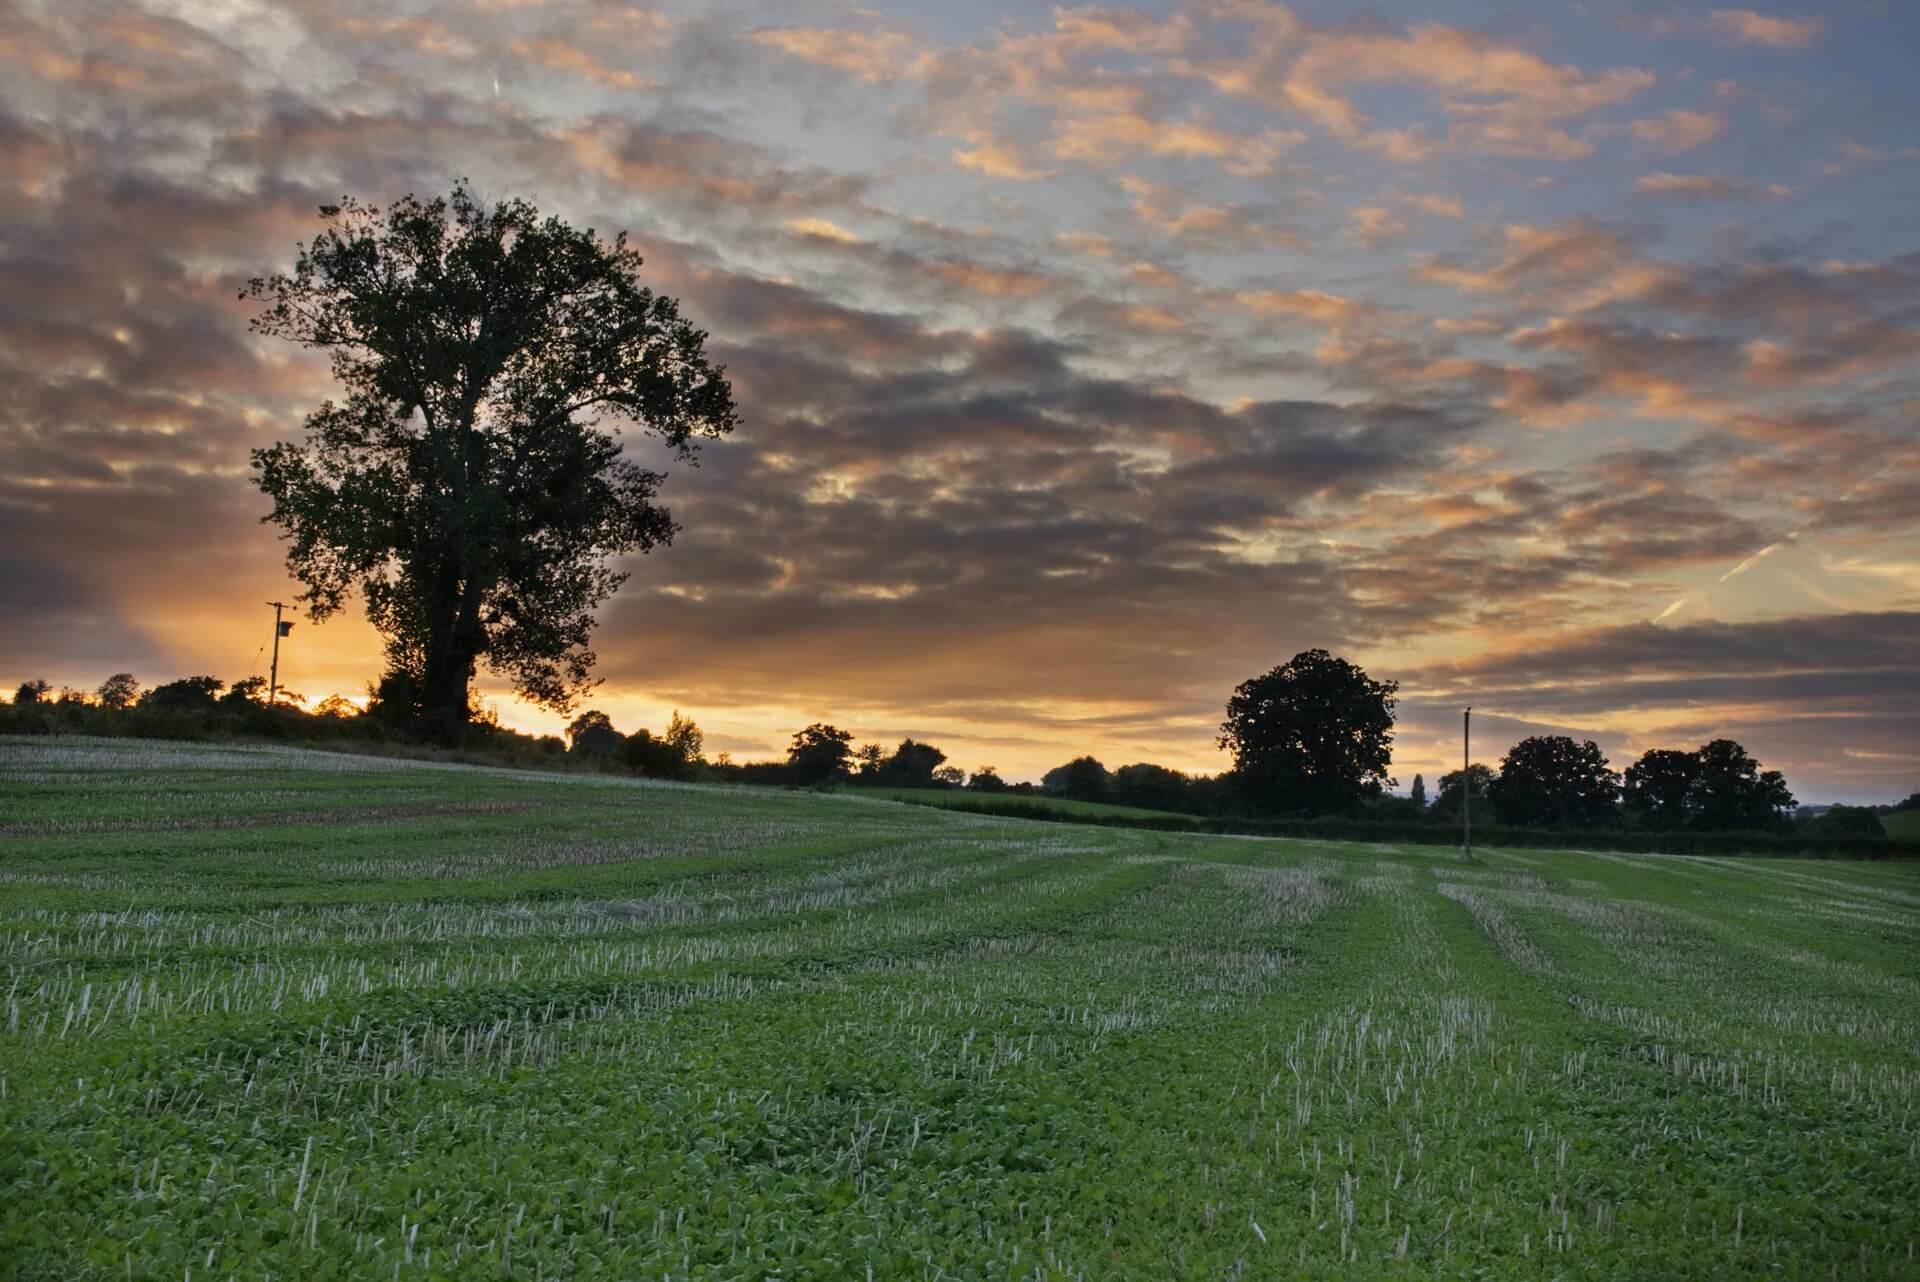 Field ay sunset